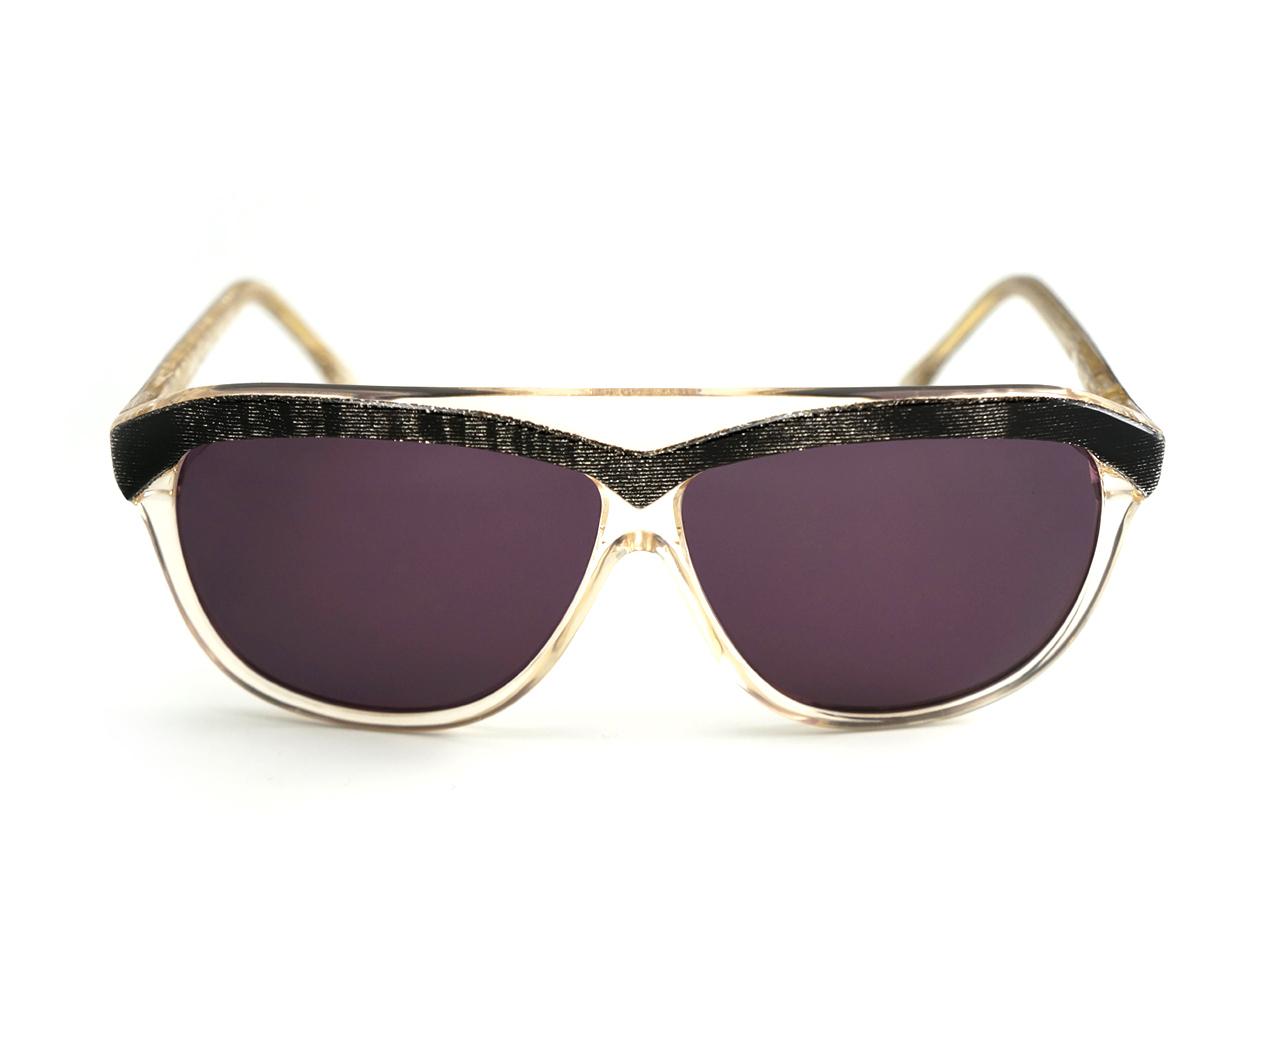 laura-biagiotti-oxsol-v60-c133-occhiale-vintage-27